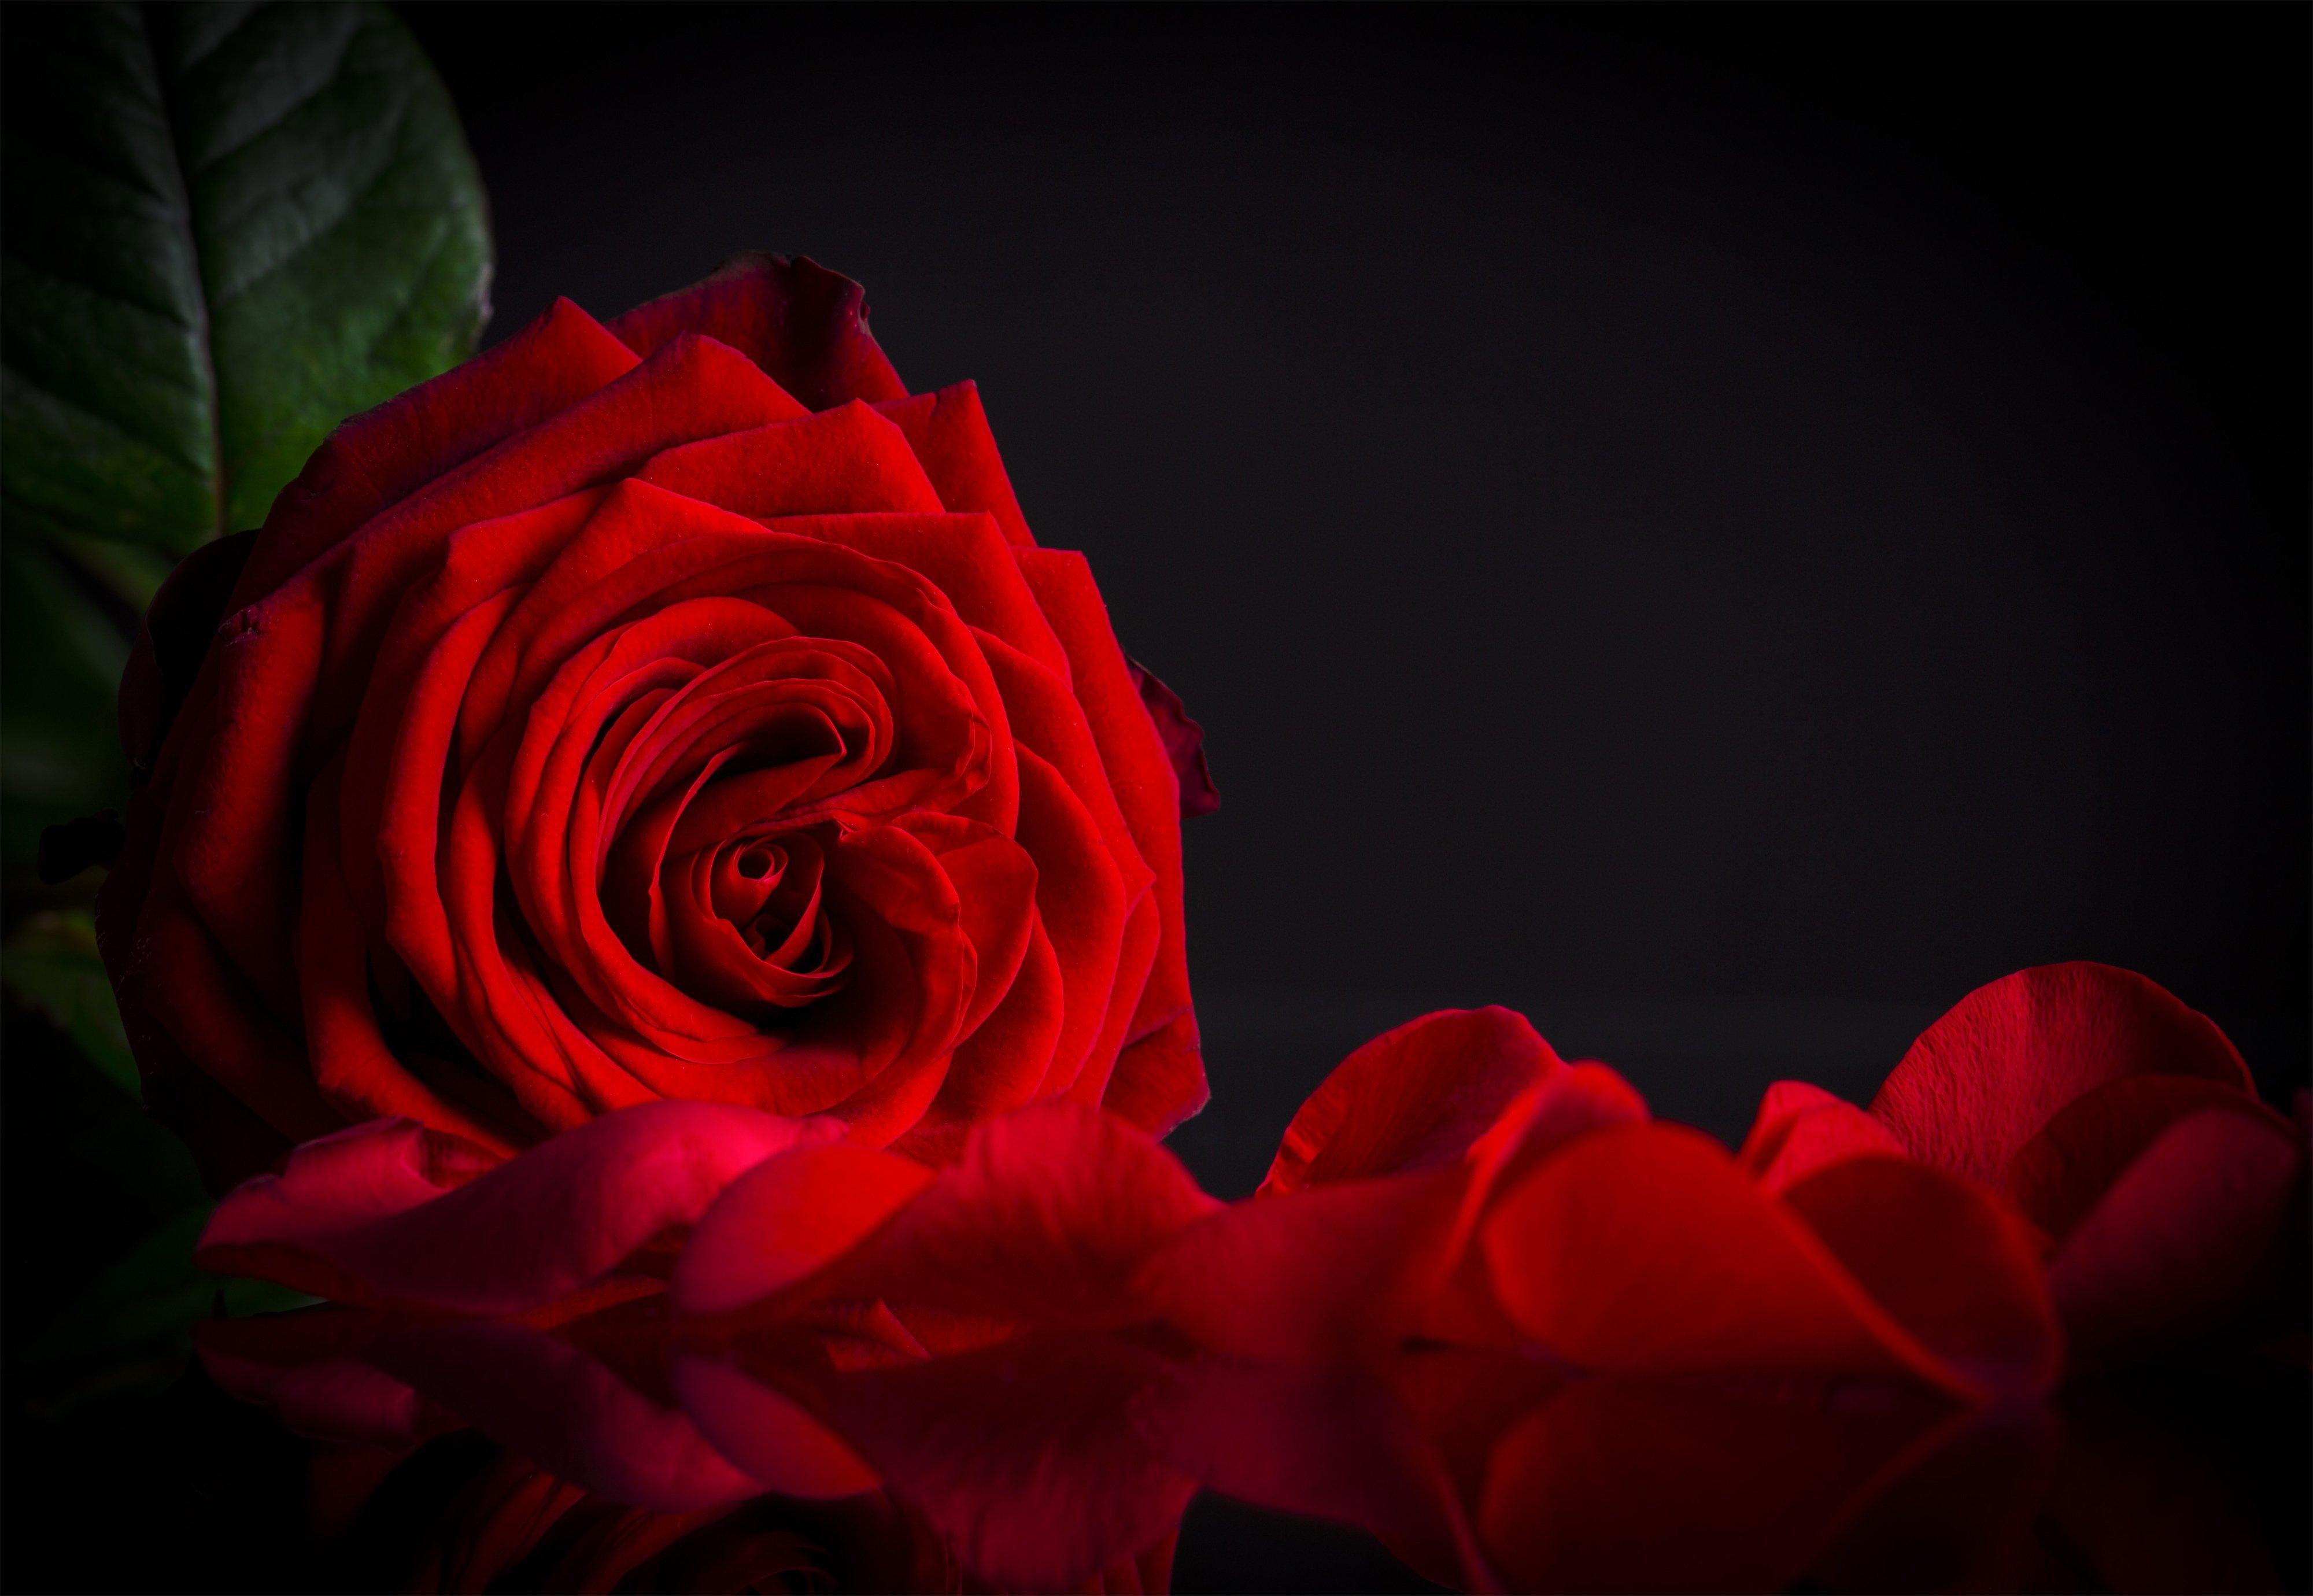 Red Roses Black Background